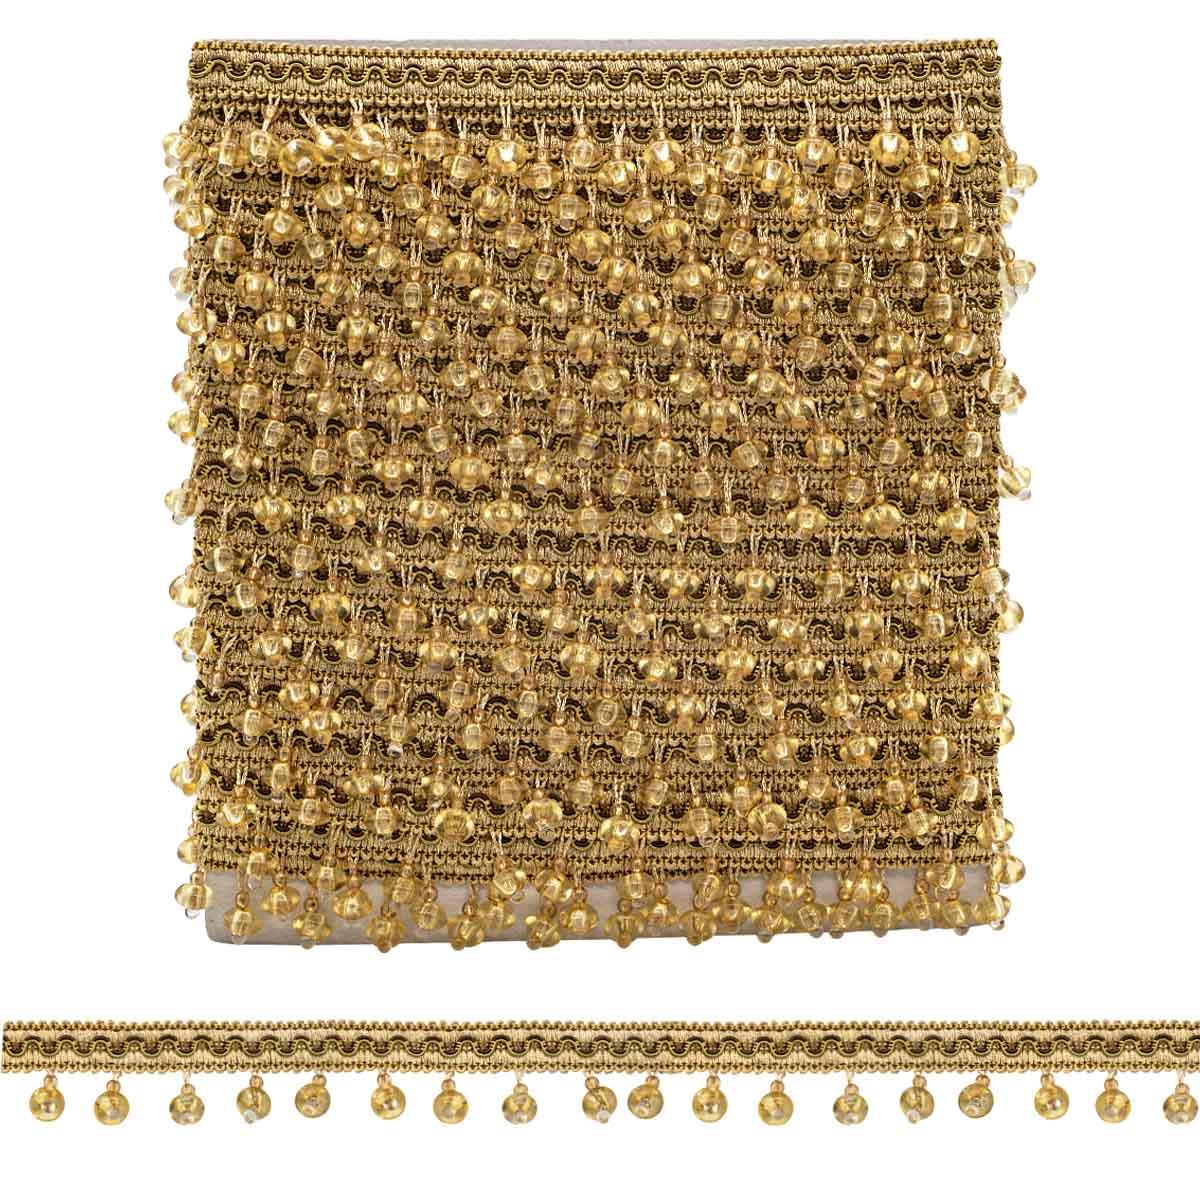 RY20-2 золотой бахрома стеклярус (4 см/12 м)